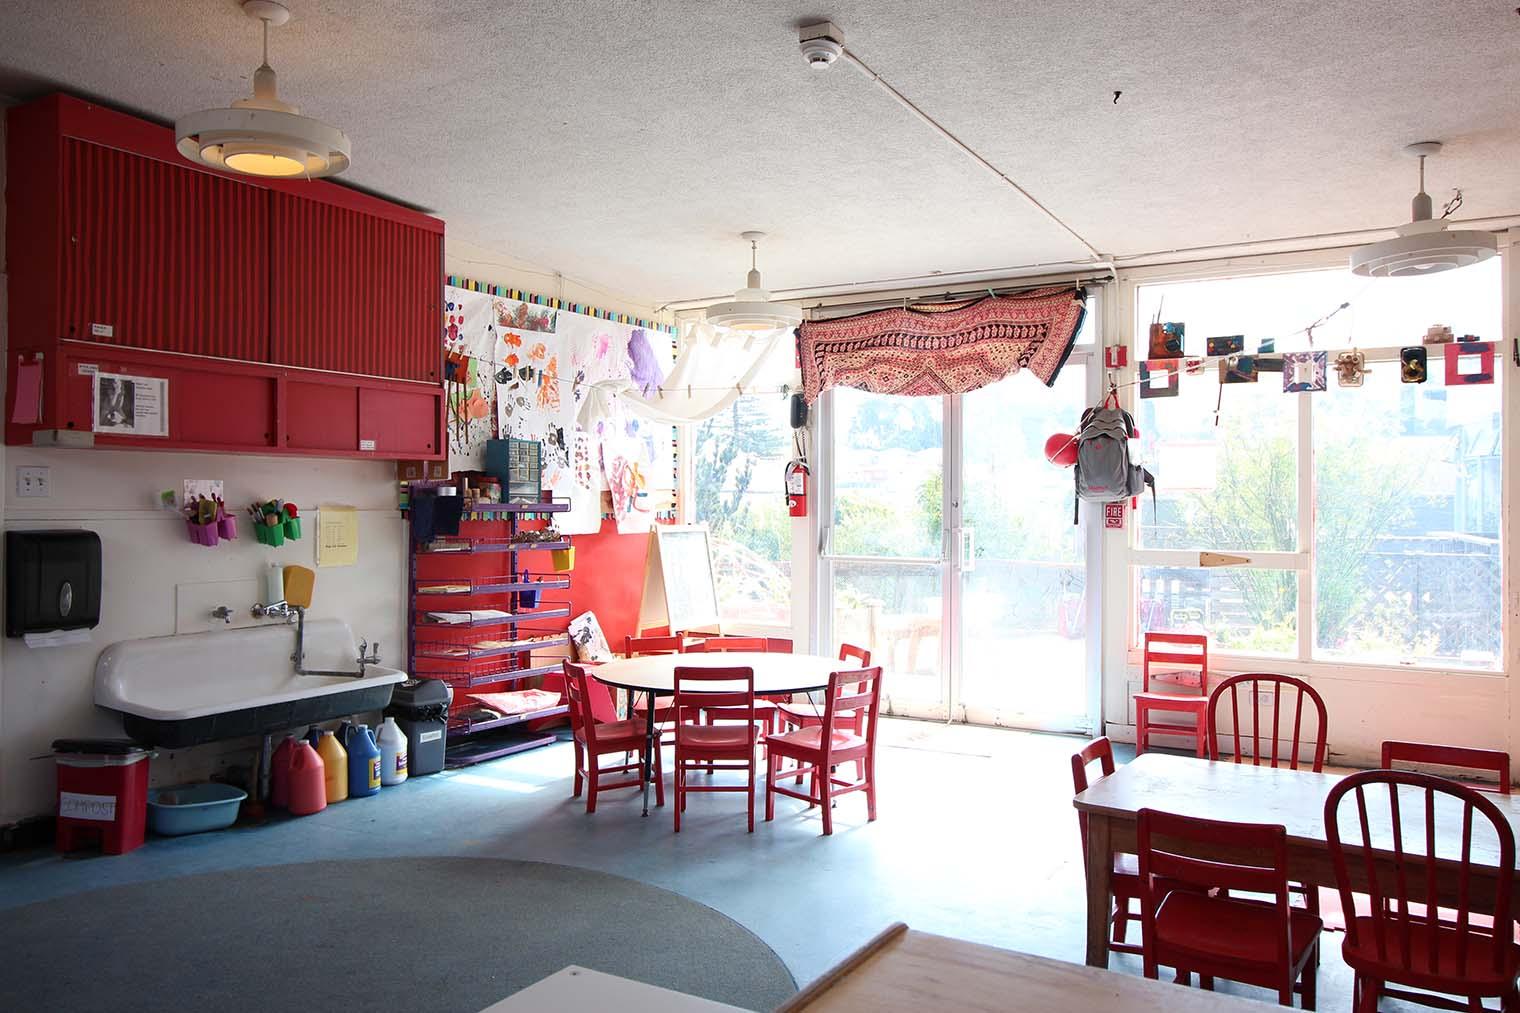 red-room-2.JPG